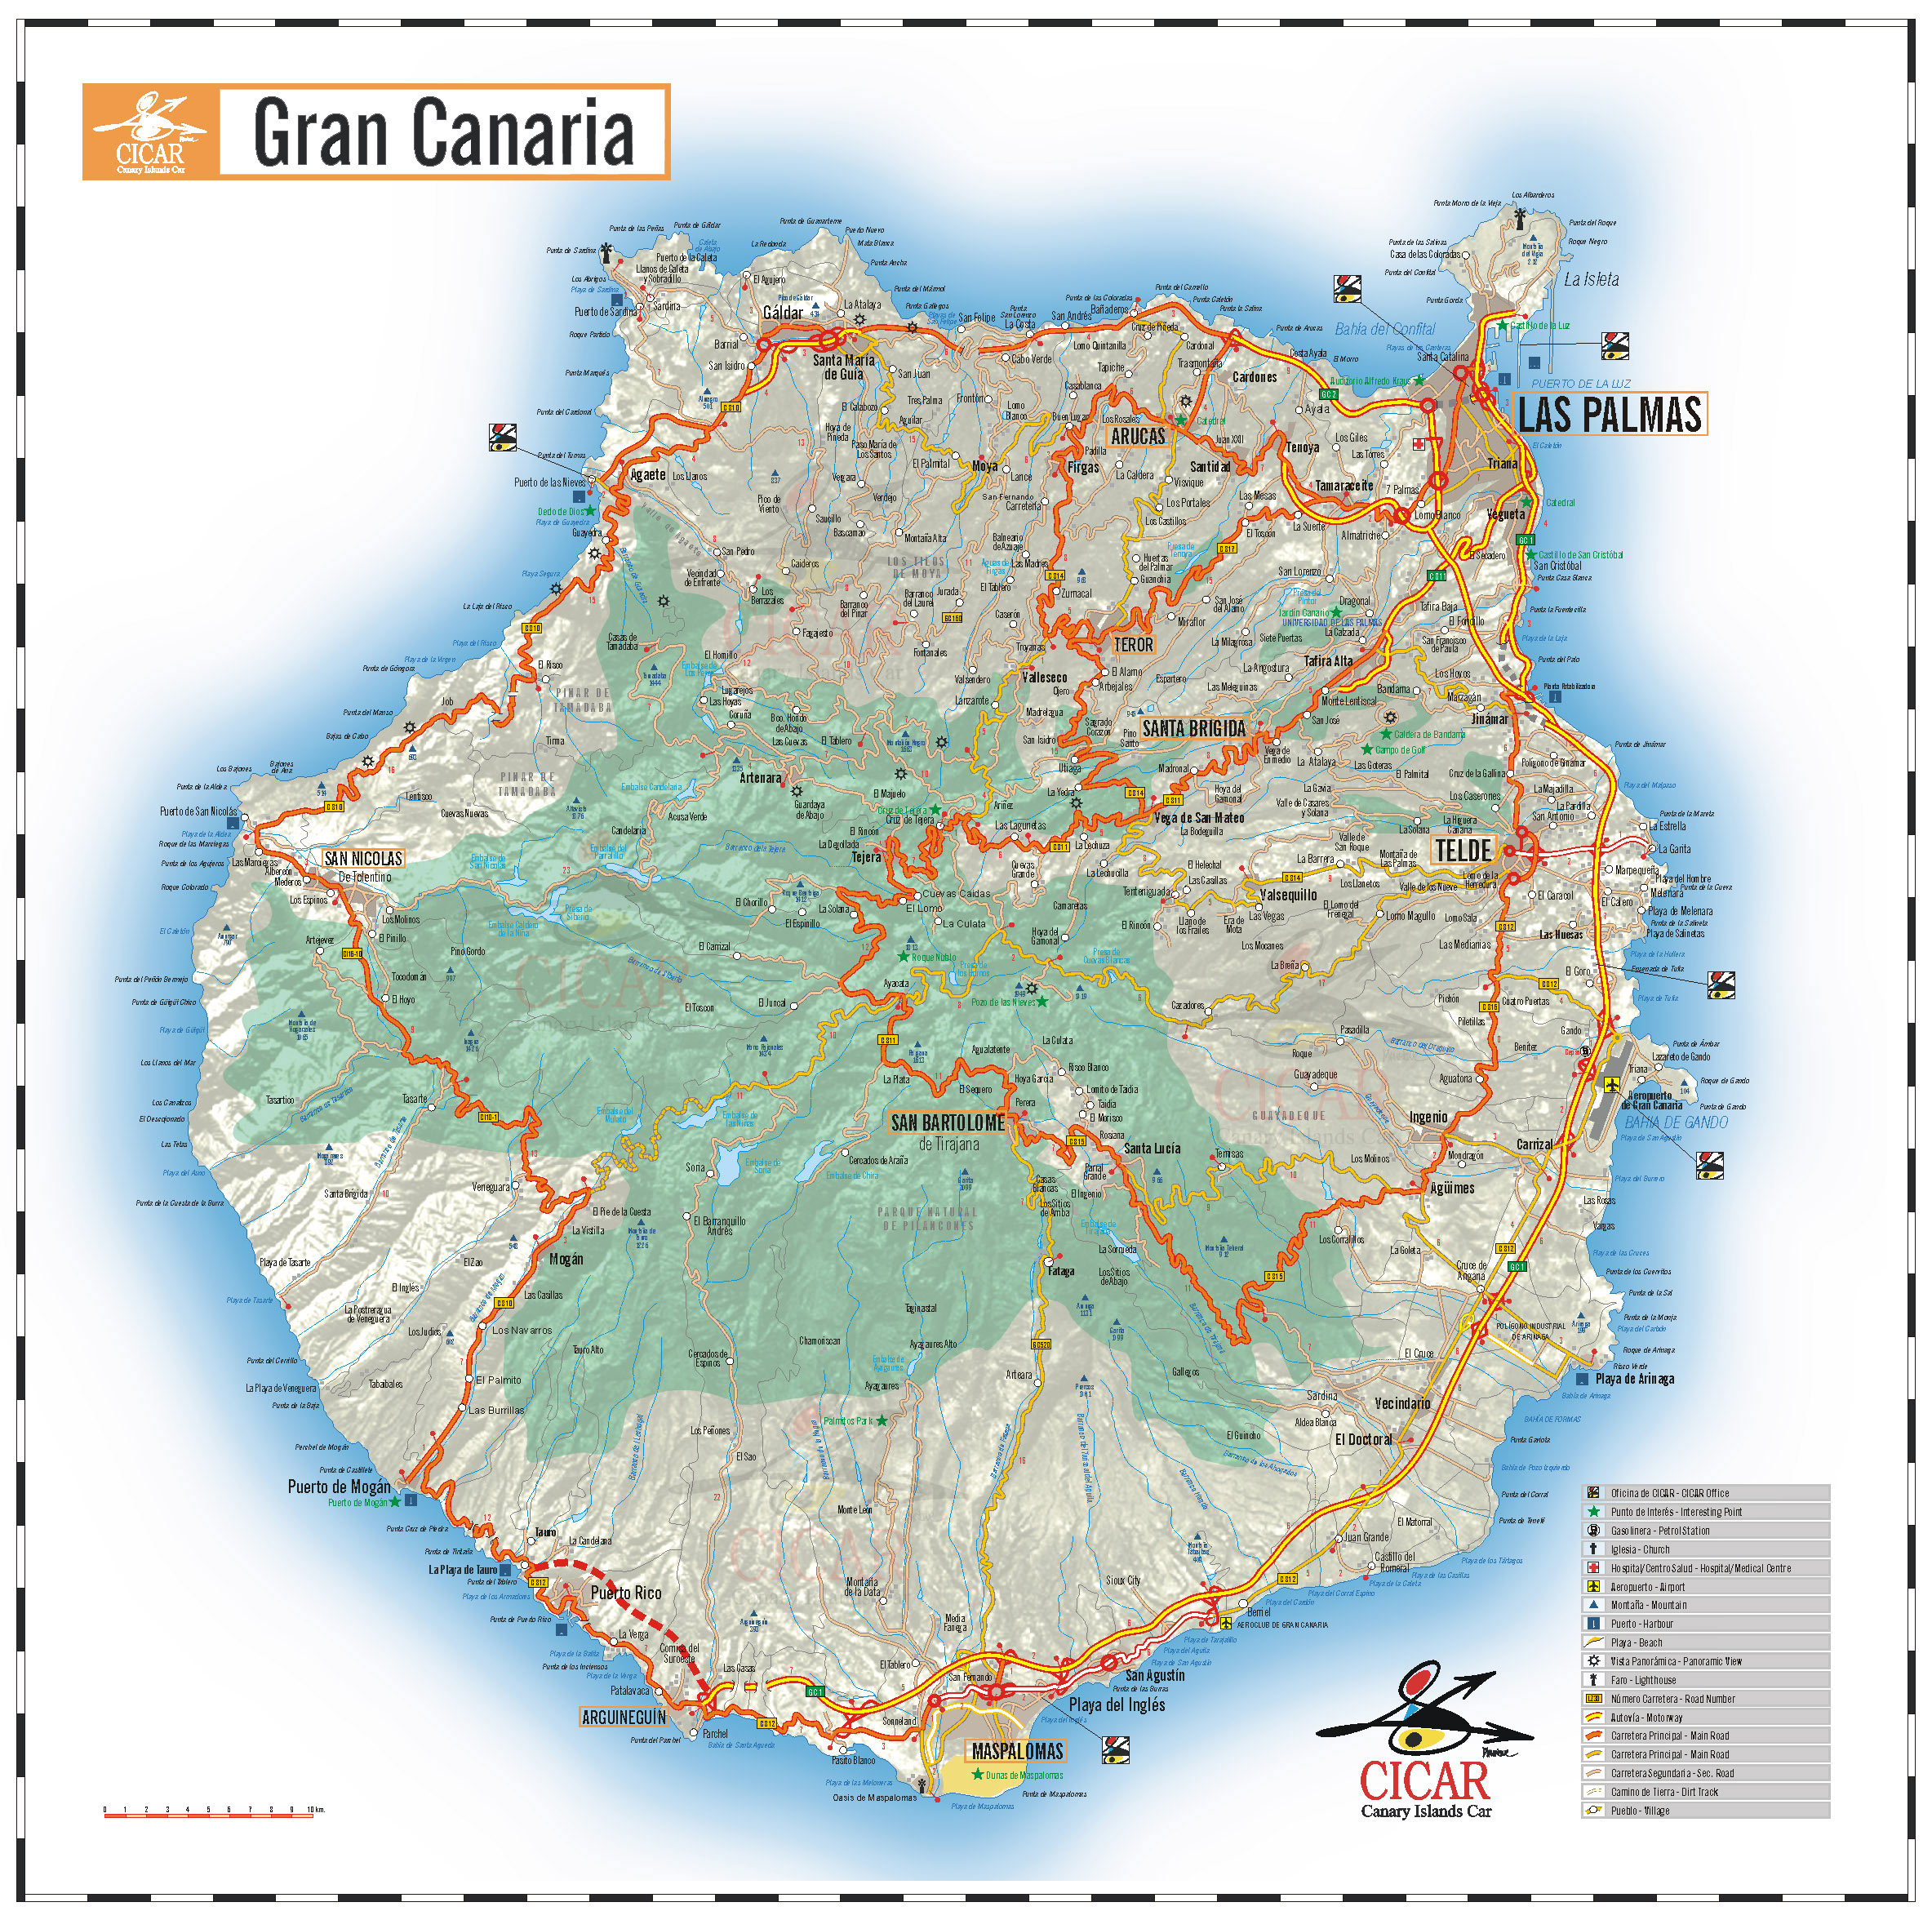 Gran Canaria Island road map